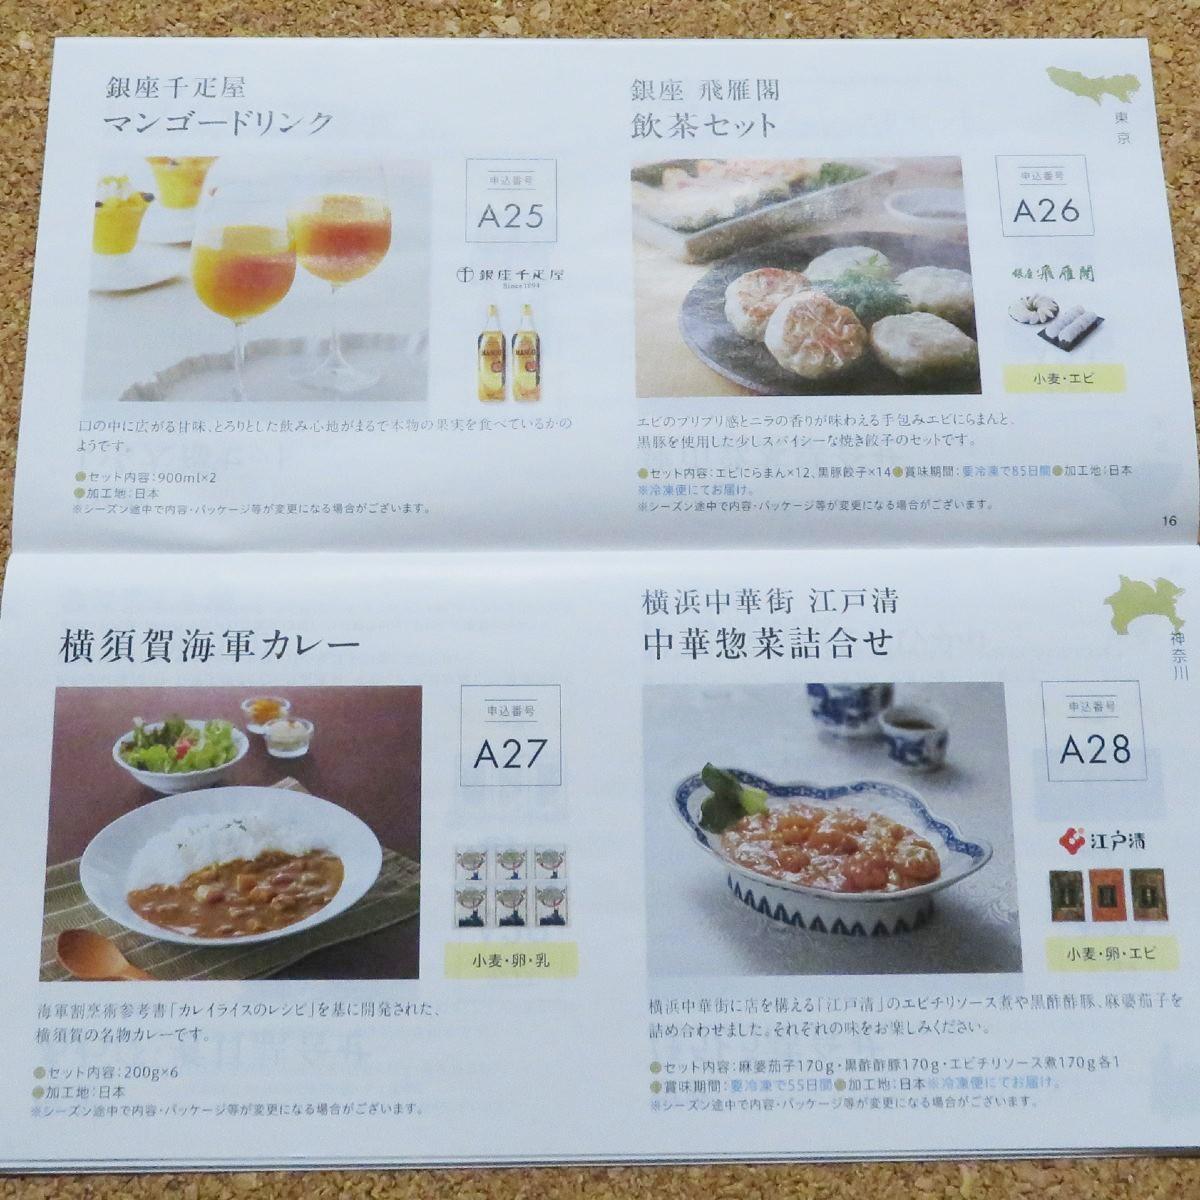 KDDIの株主優待カタログ